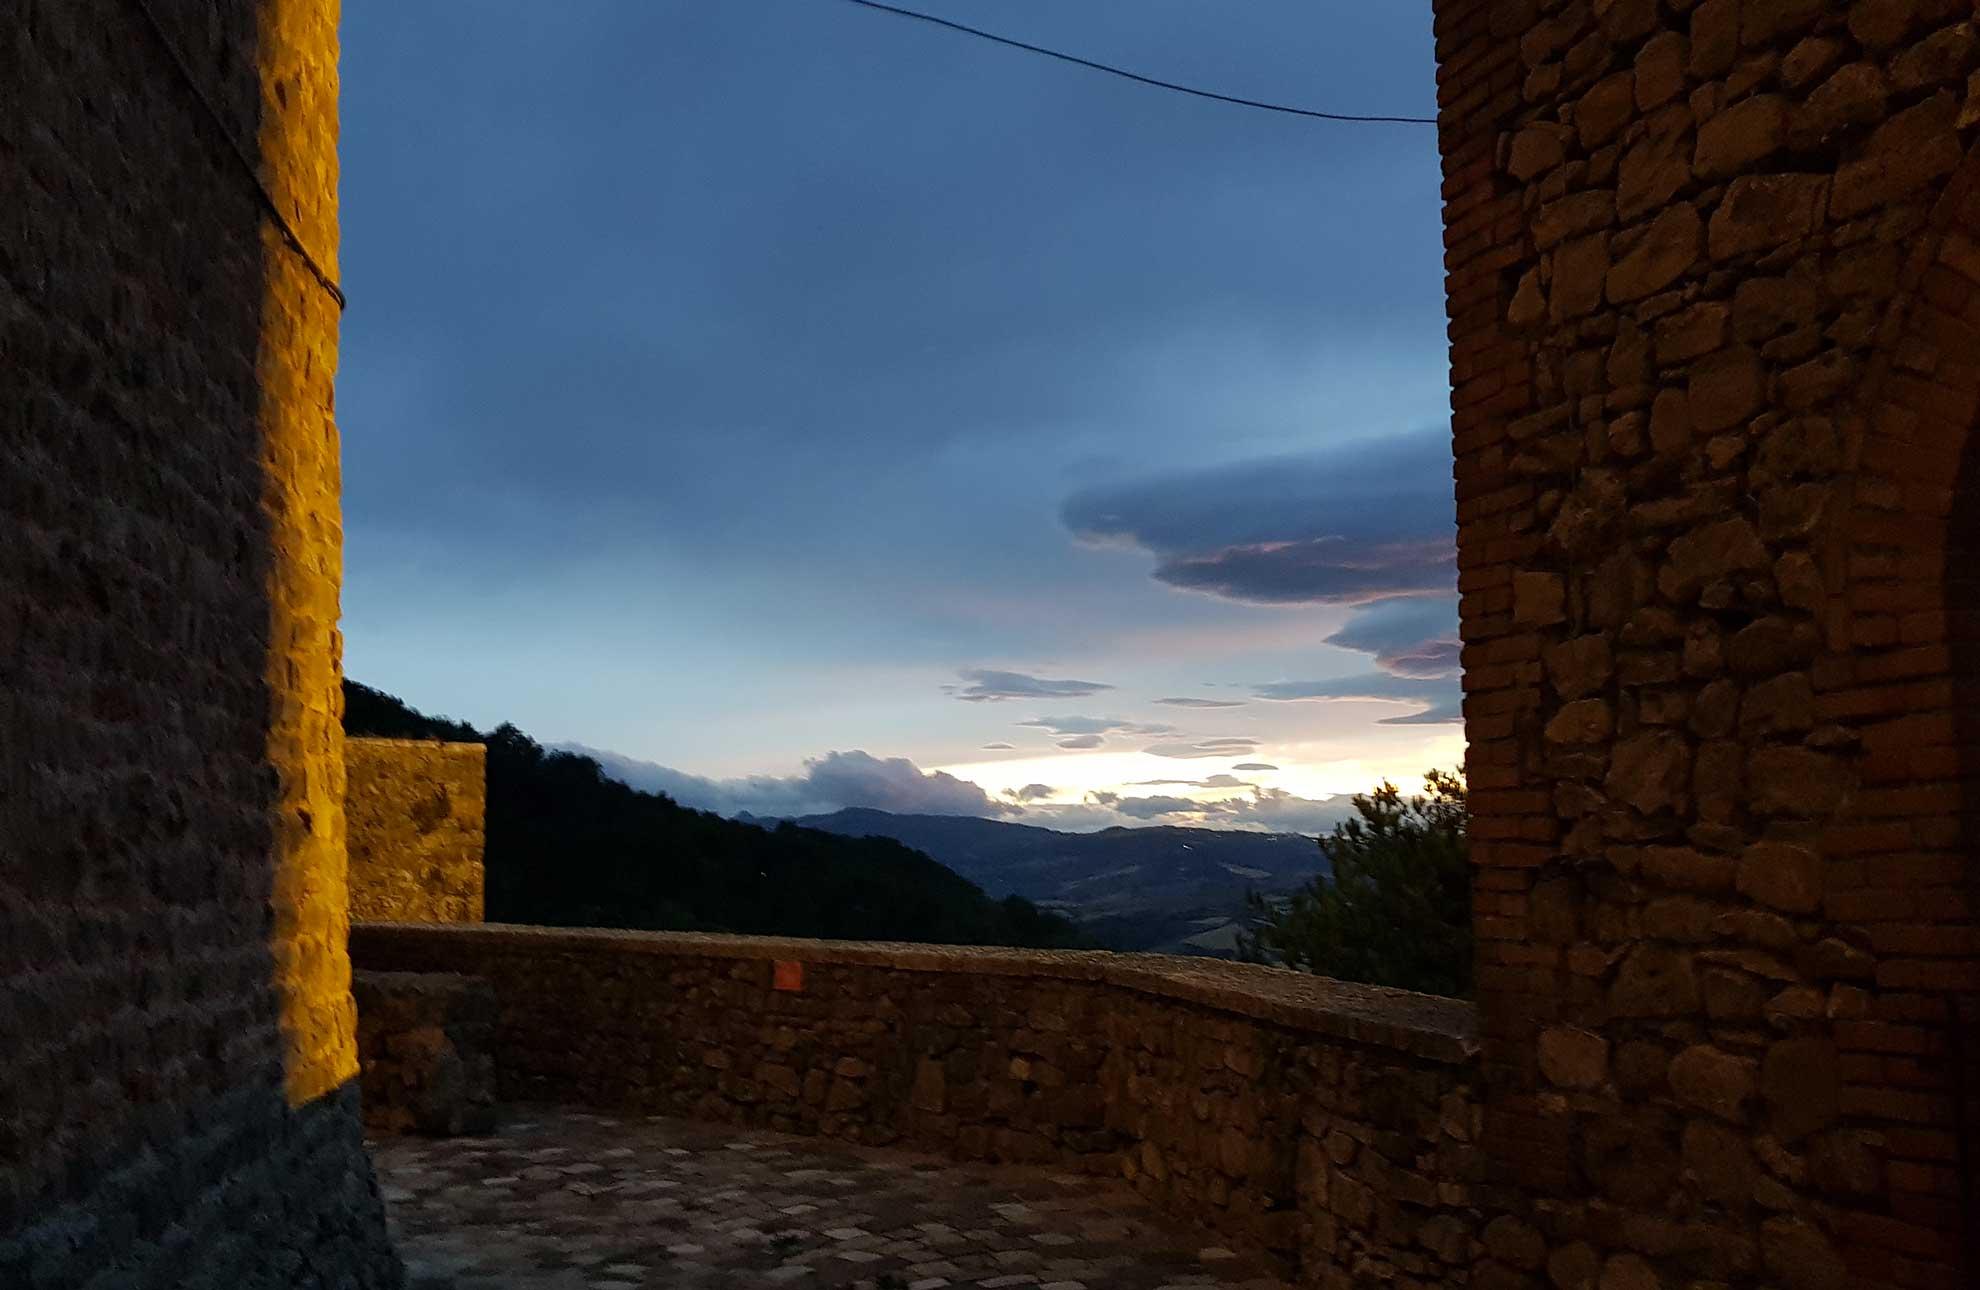 Montefiore: entroterra riviera romagnola